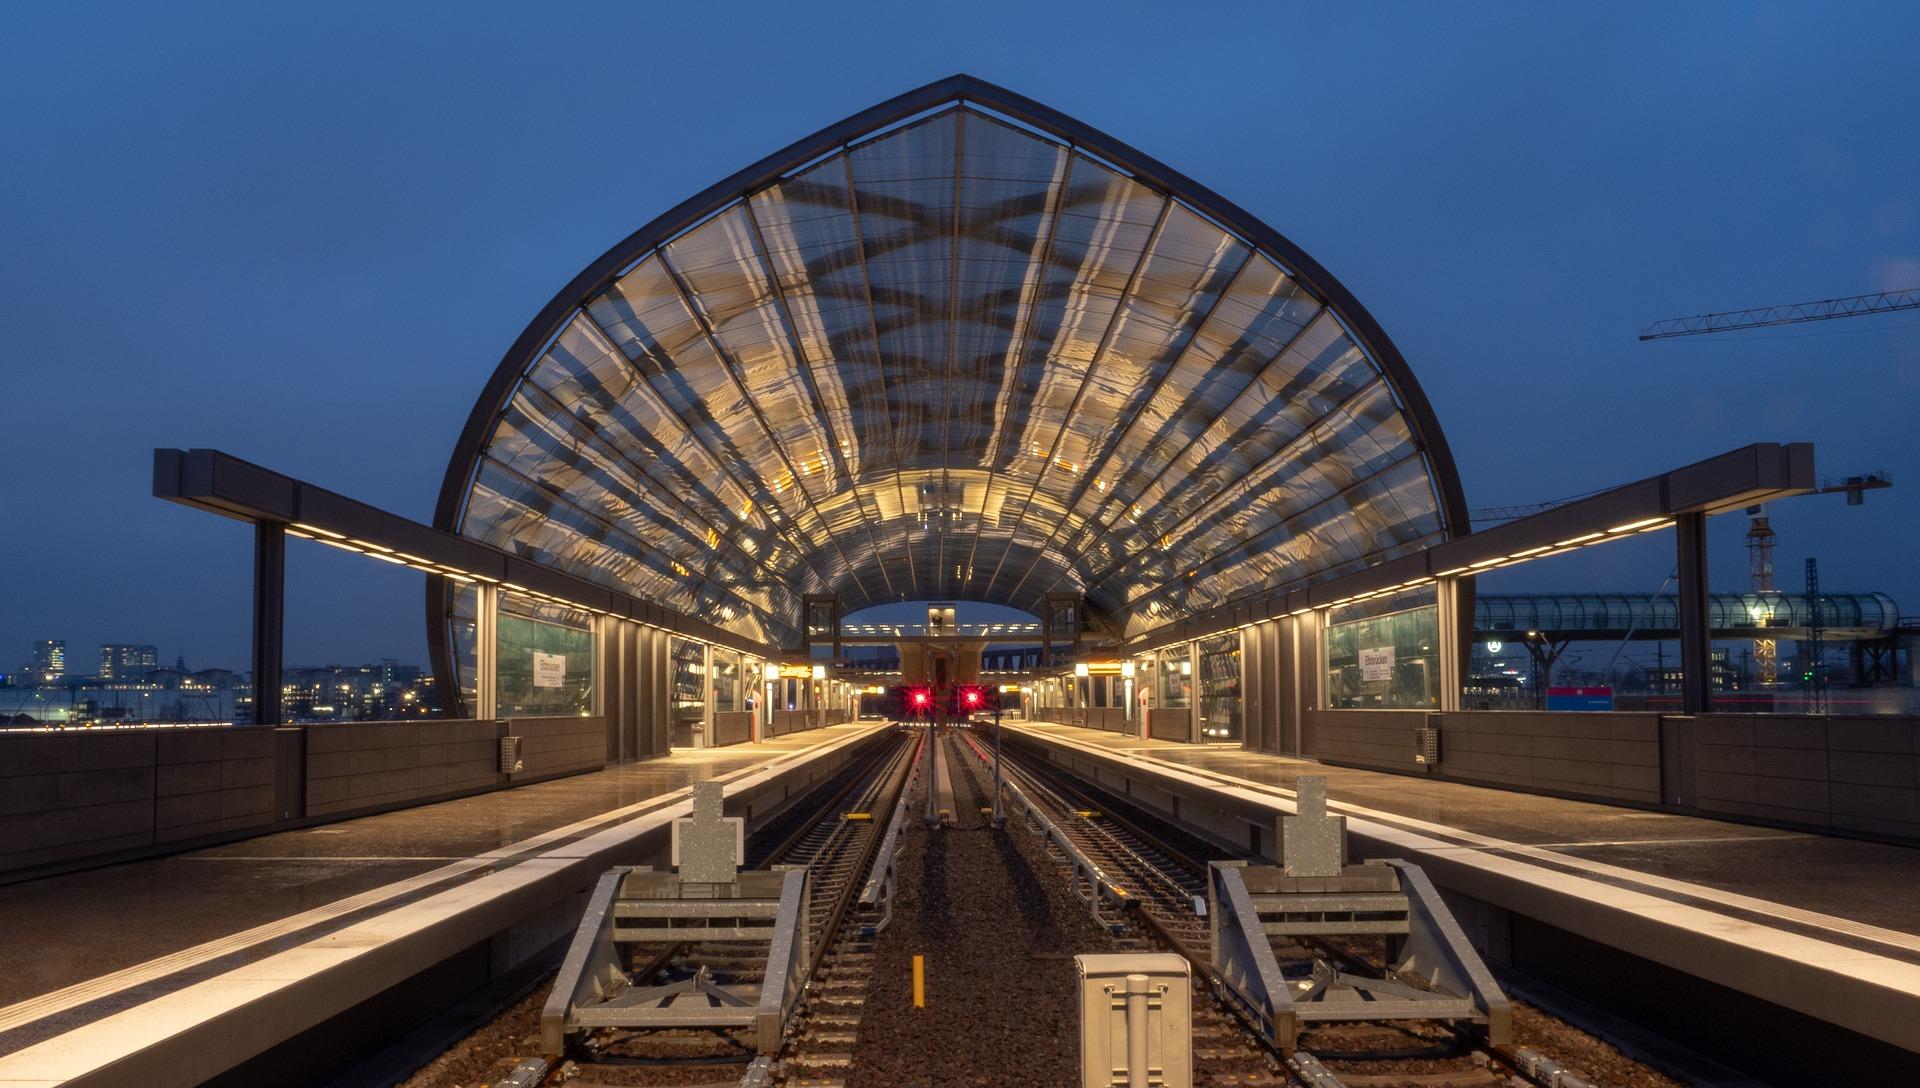 S-Bahn Station Elbbrücke in Hamburg